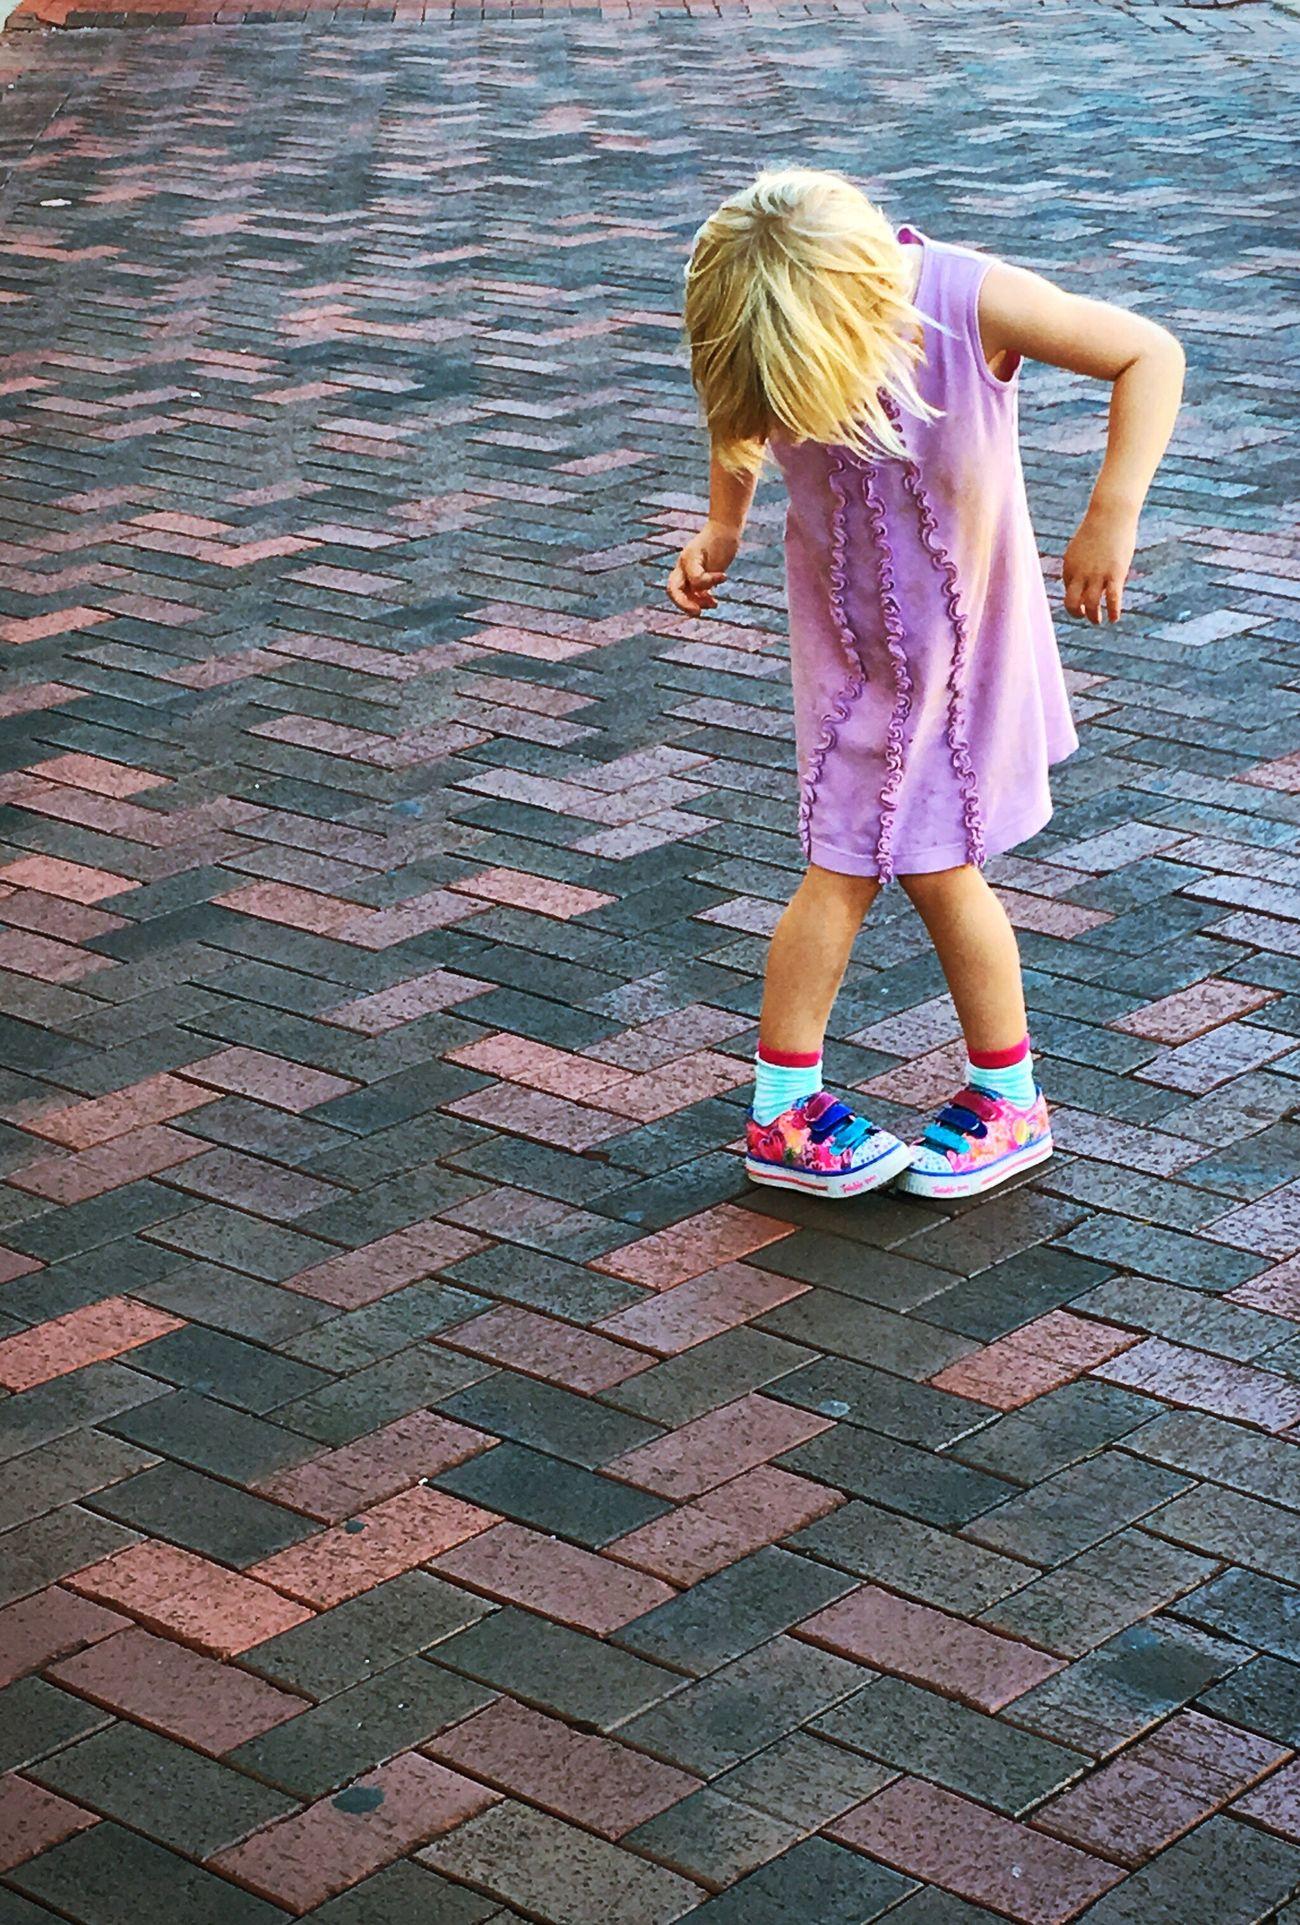 Capture. IPhoneography Picoftheday Child Walk Learn Challenge Wonder Pattern Sidewalk Bricks Simplicity Create Think Childhood Girl Innocence